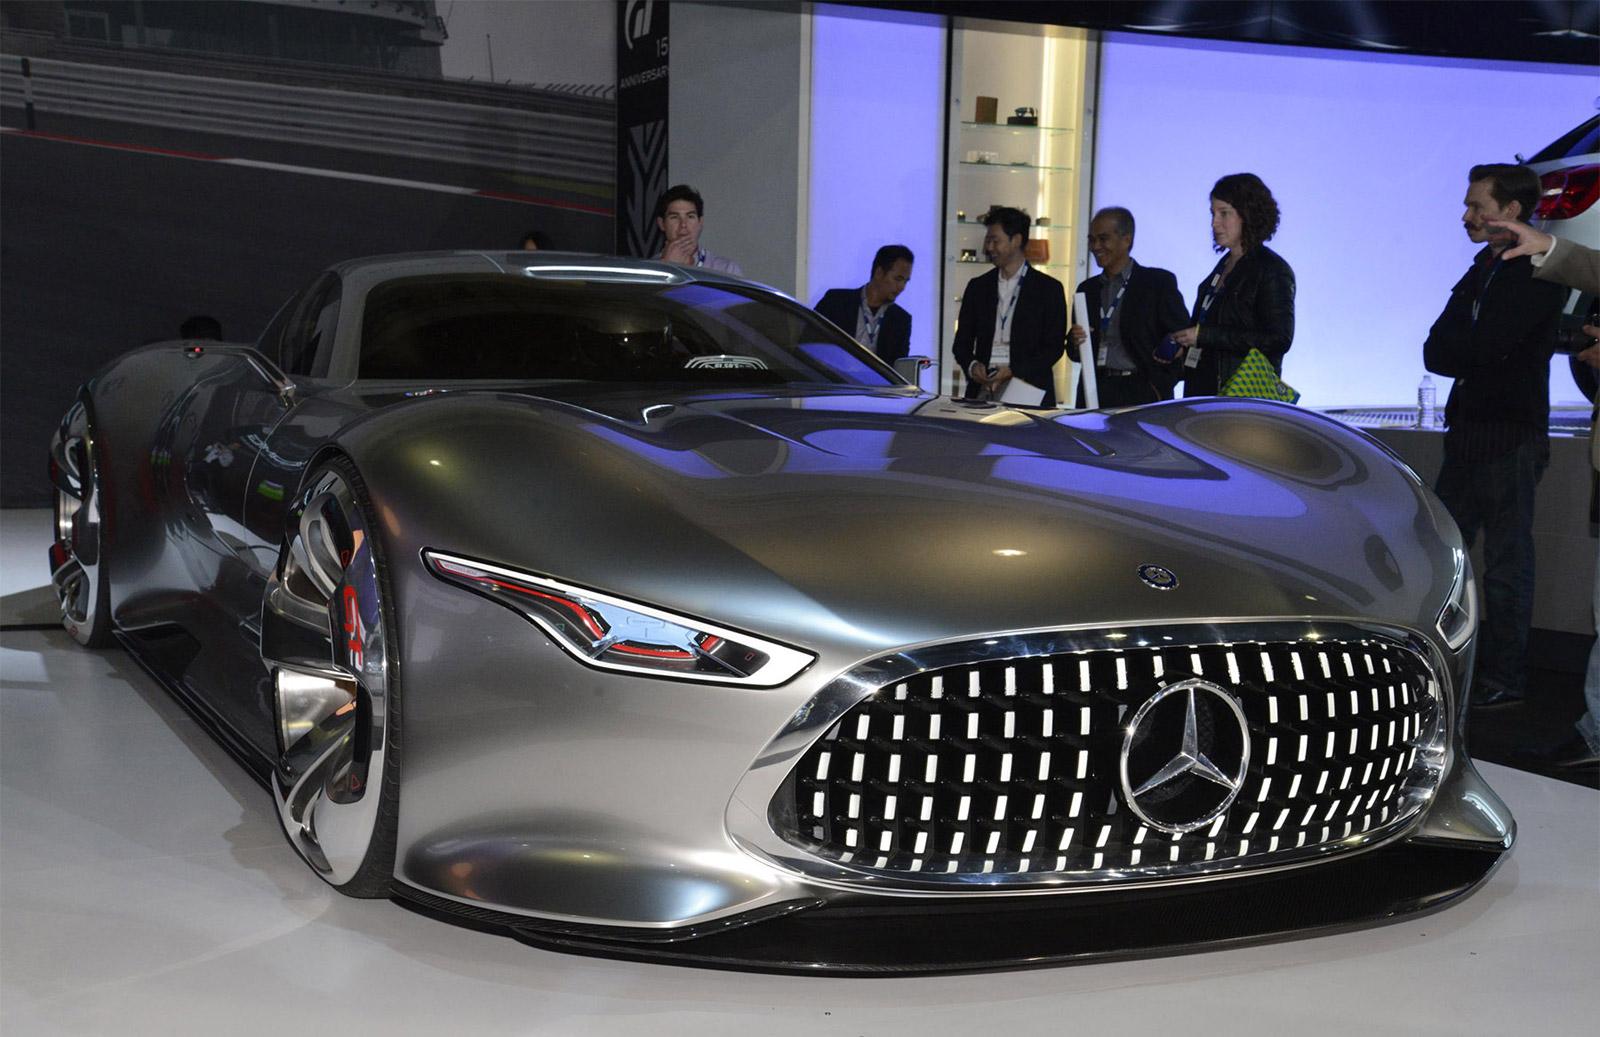 MercedesBenz AMG Vision Gran Turismo LA Auto Show Video - Mercedes car show